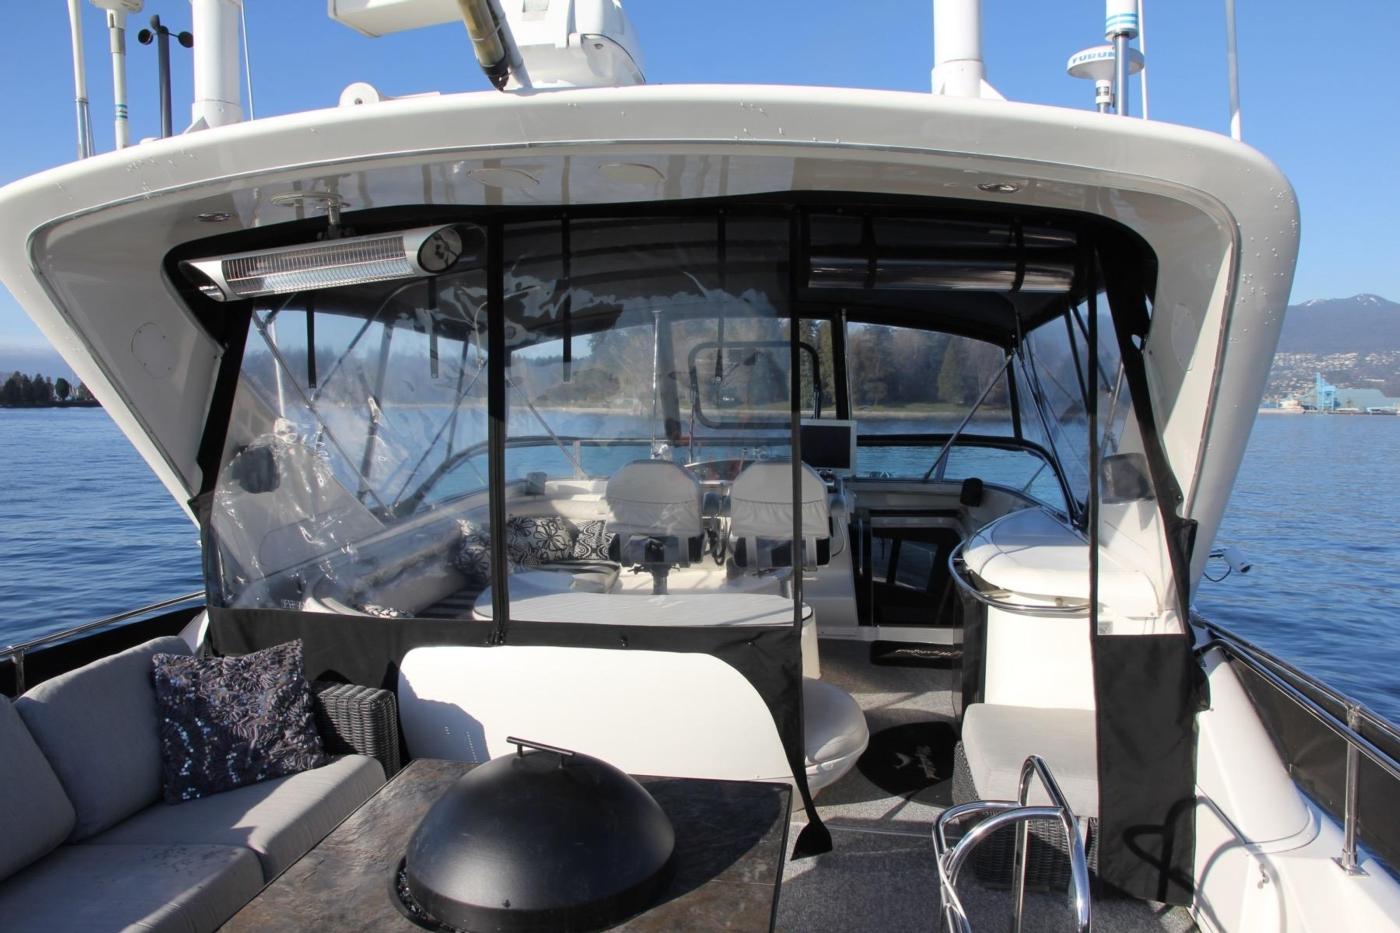 1999 Bayliner 5788 Pilot House Motoryacht, Entertainment Area Looking Forward